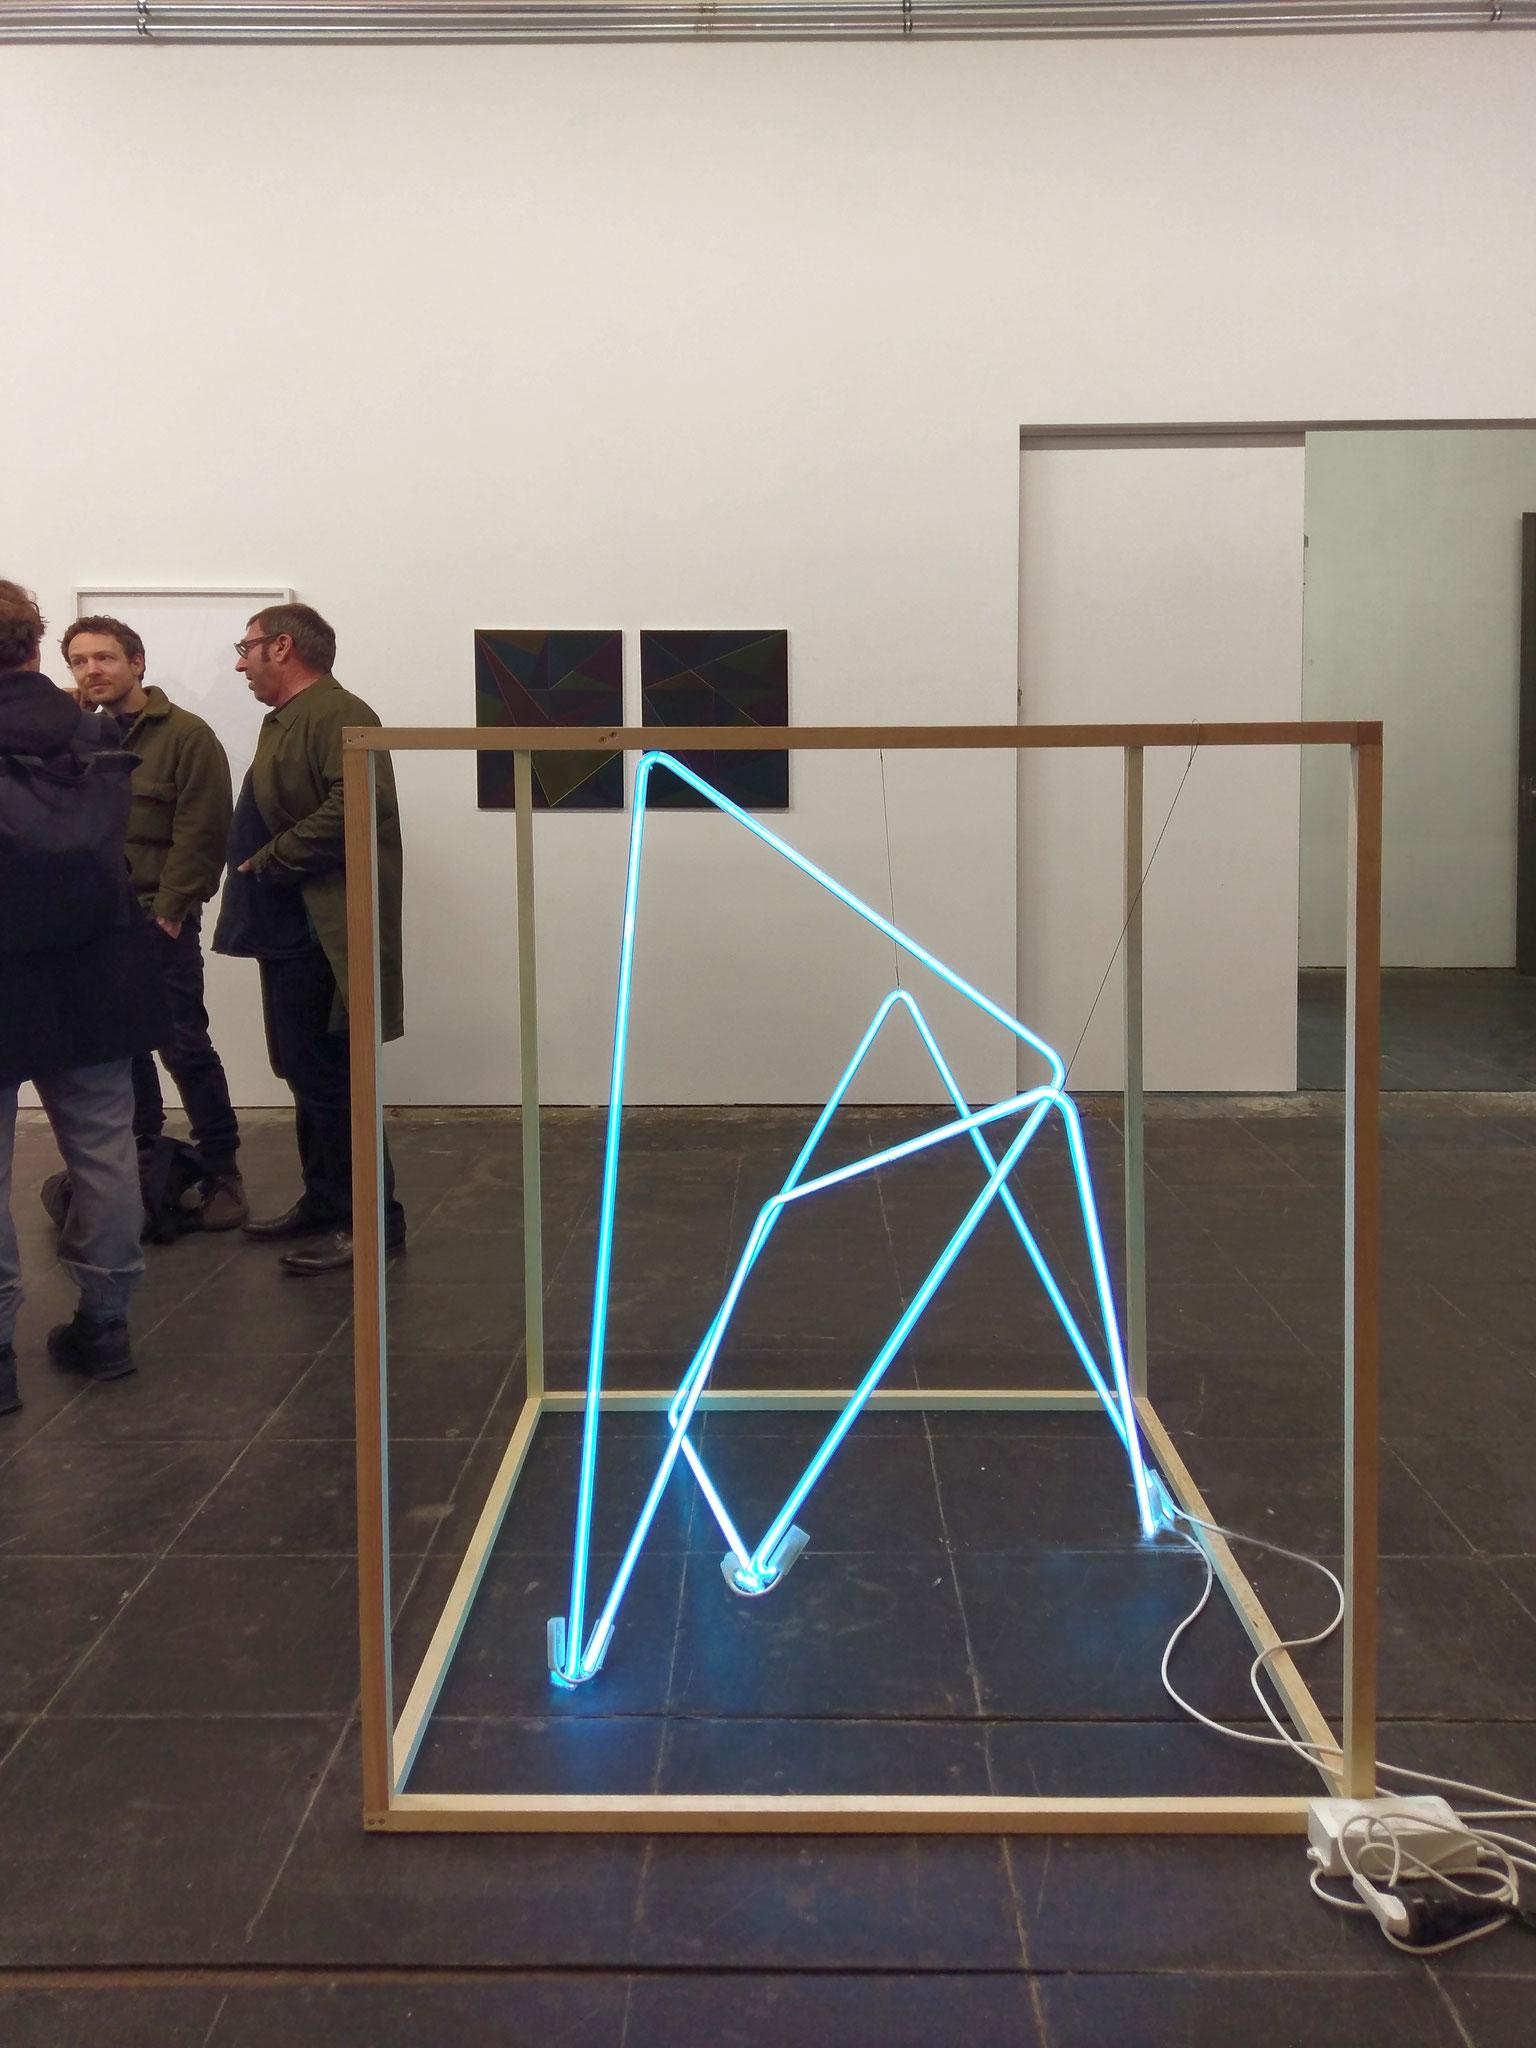 three lines eight corners 02, 2019, Neonglas je 300 cm, Kubus Holz 125 x 115 x 115 cm, Adria Berlin